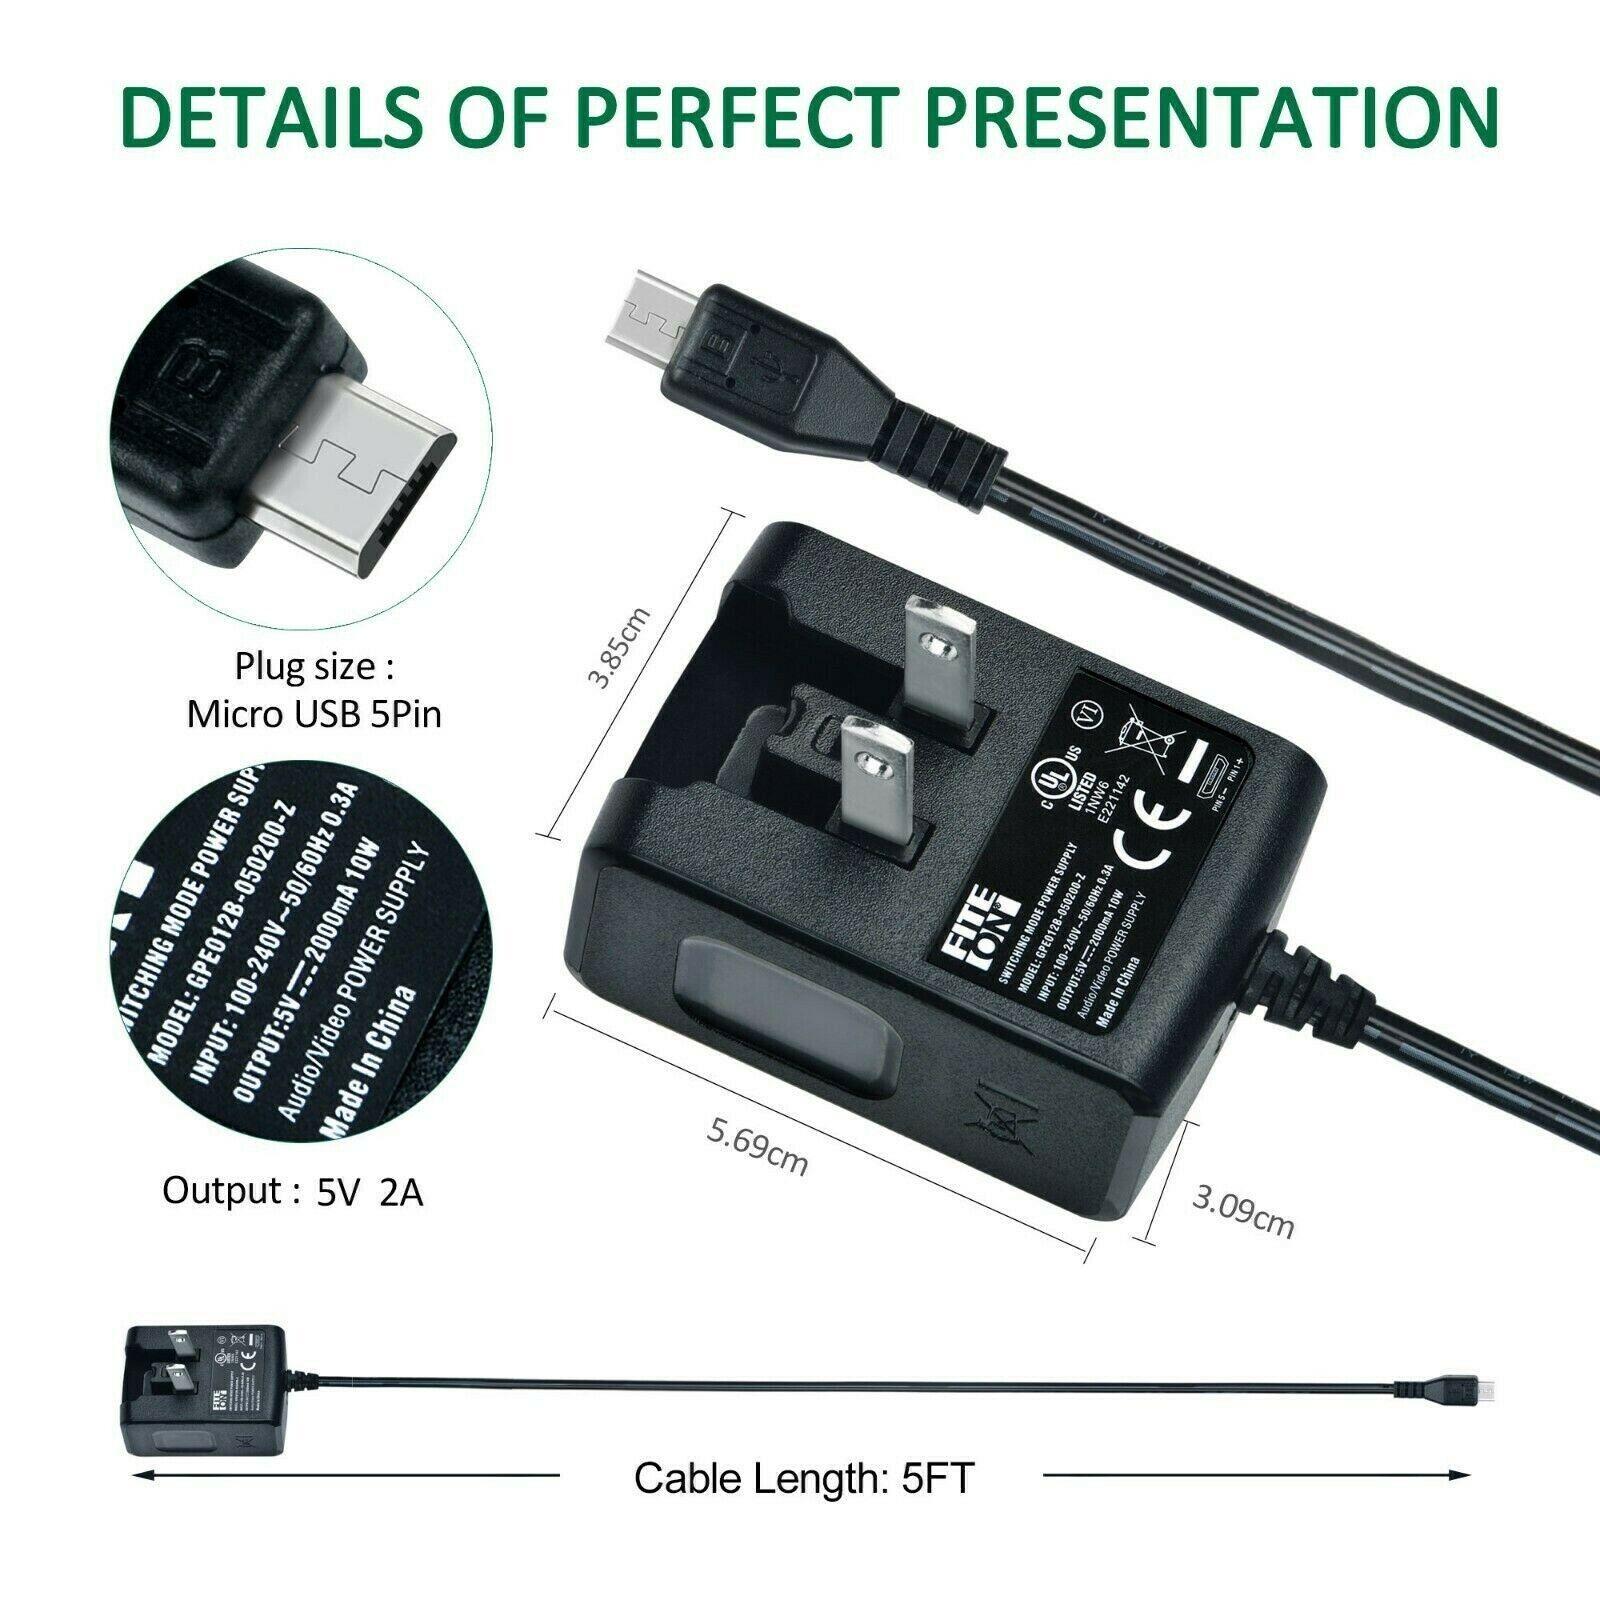 Data SYNC Cable Cord for Kurio 7s 96125 C13000 Kids Tablet POWE-Tech USB DC Power Charger